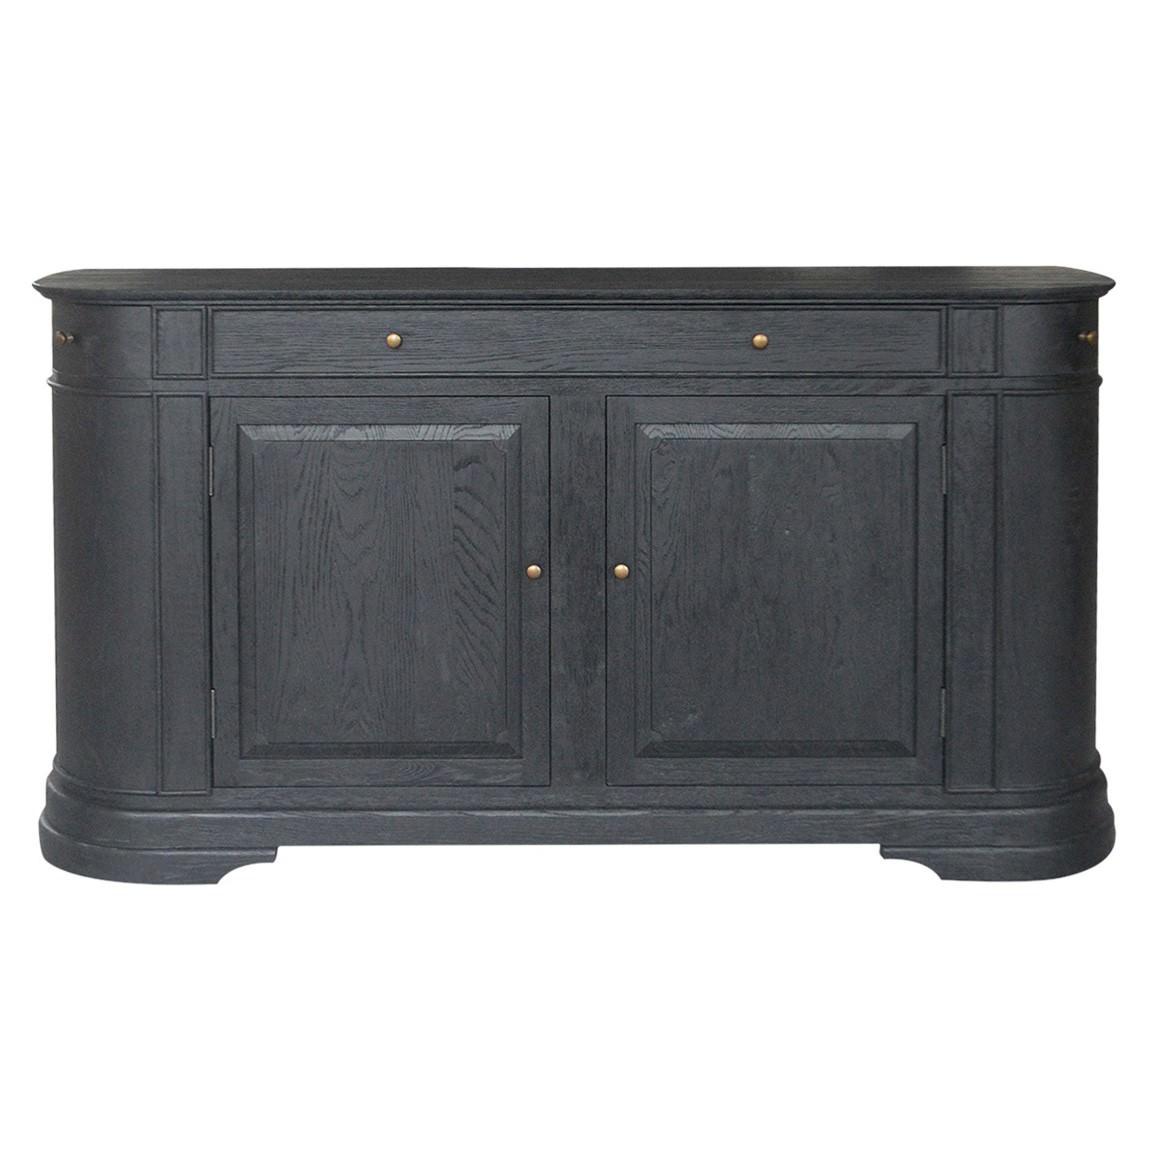 William John Oak Timber 2 Door 3 Drawer Sideboard, 183cm, Black Oak